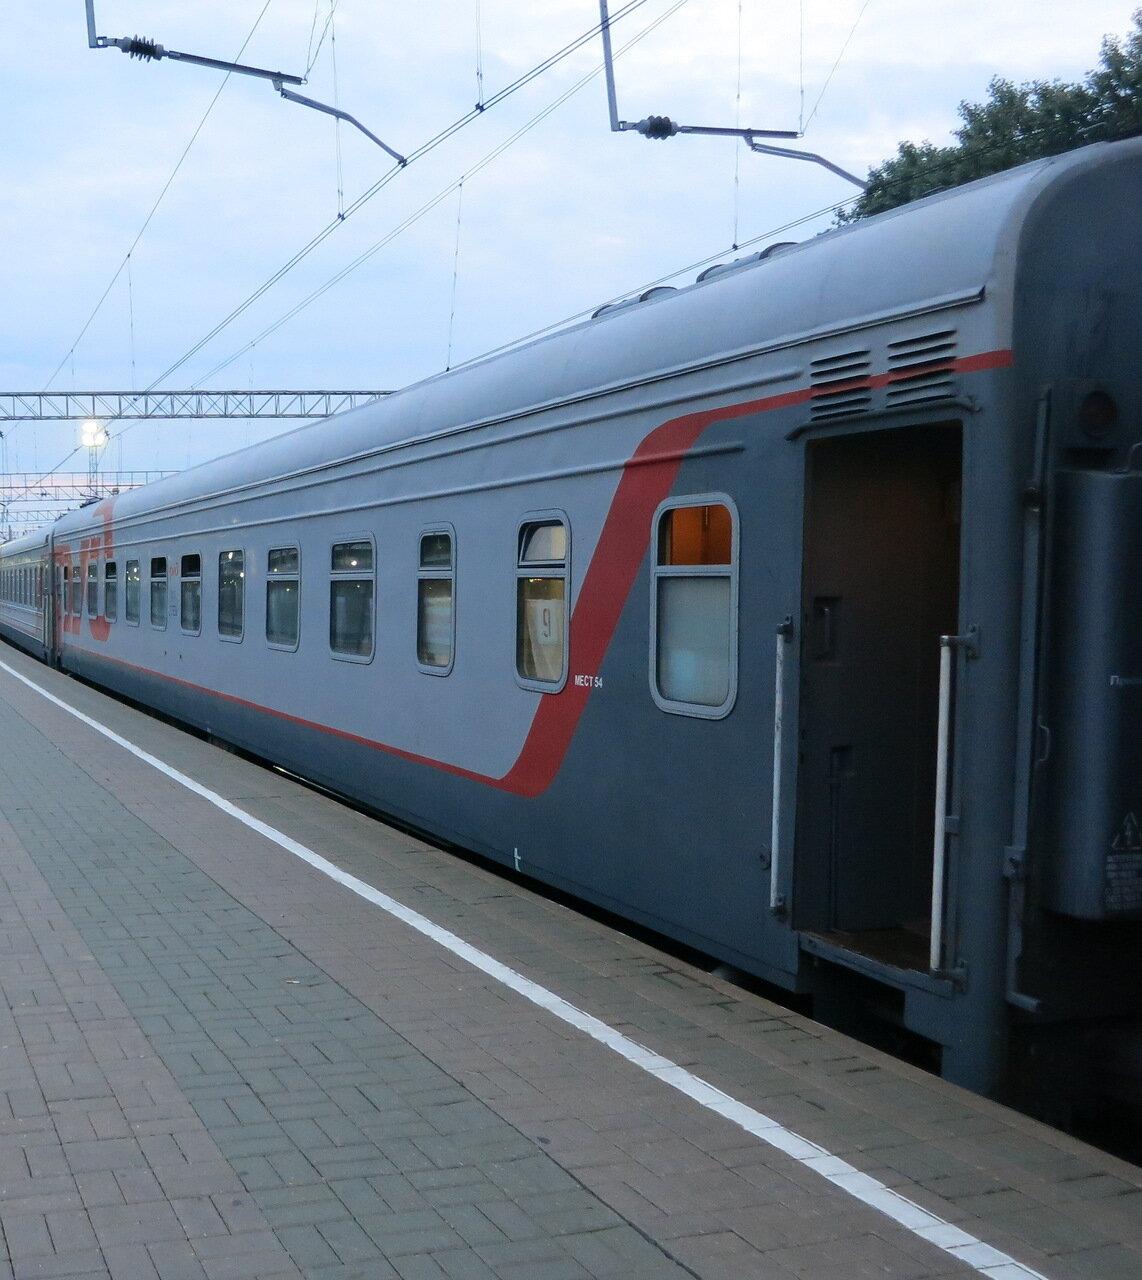 Фото купейный вагон поезд 350 москва анапа 4